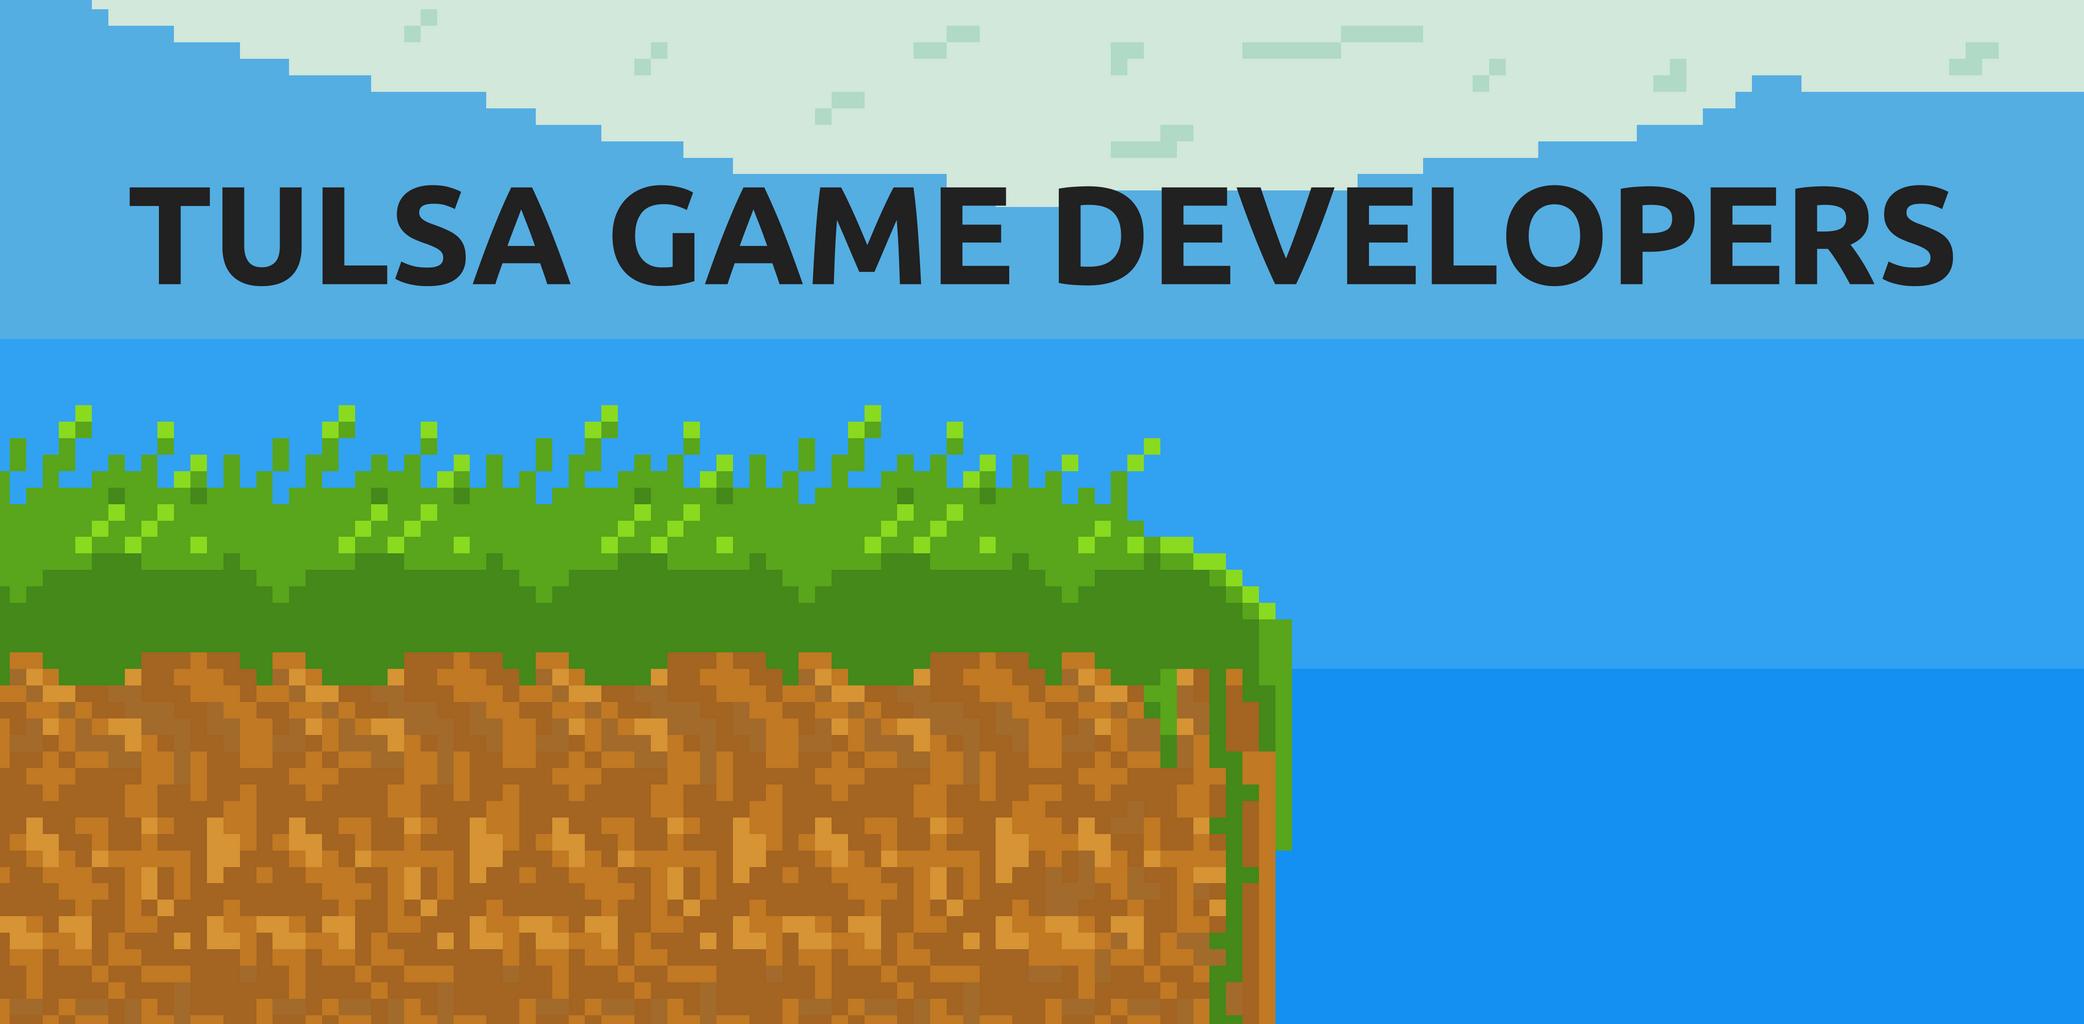 Tulsa Game Developers